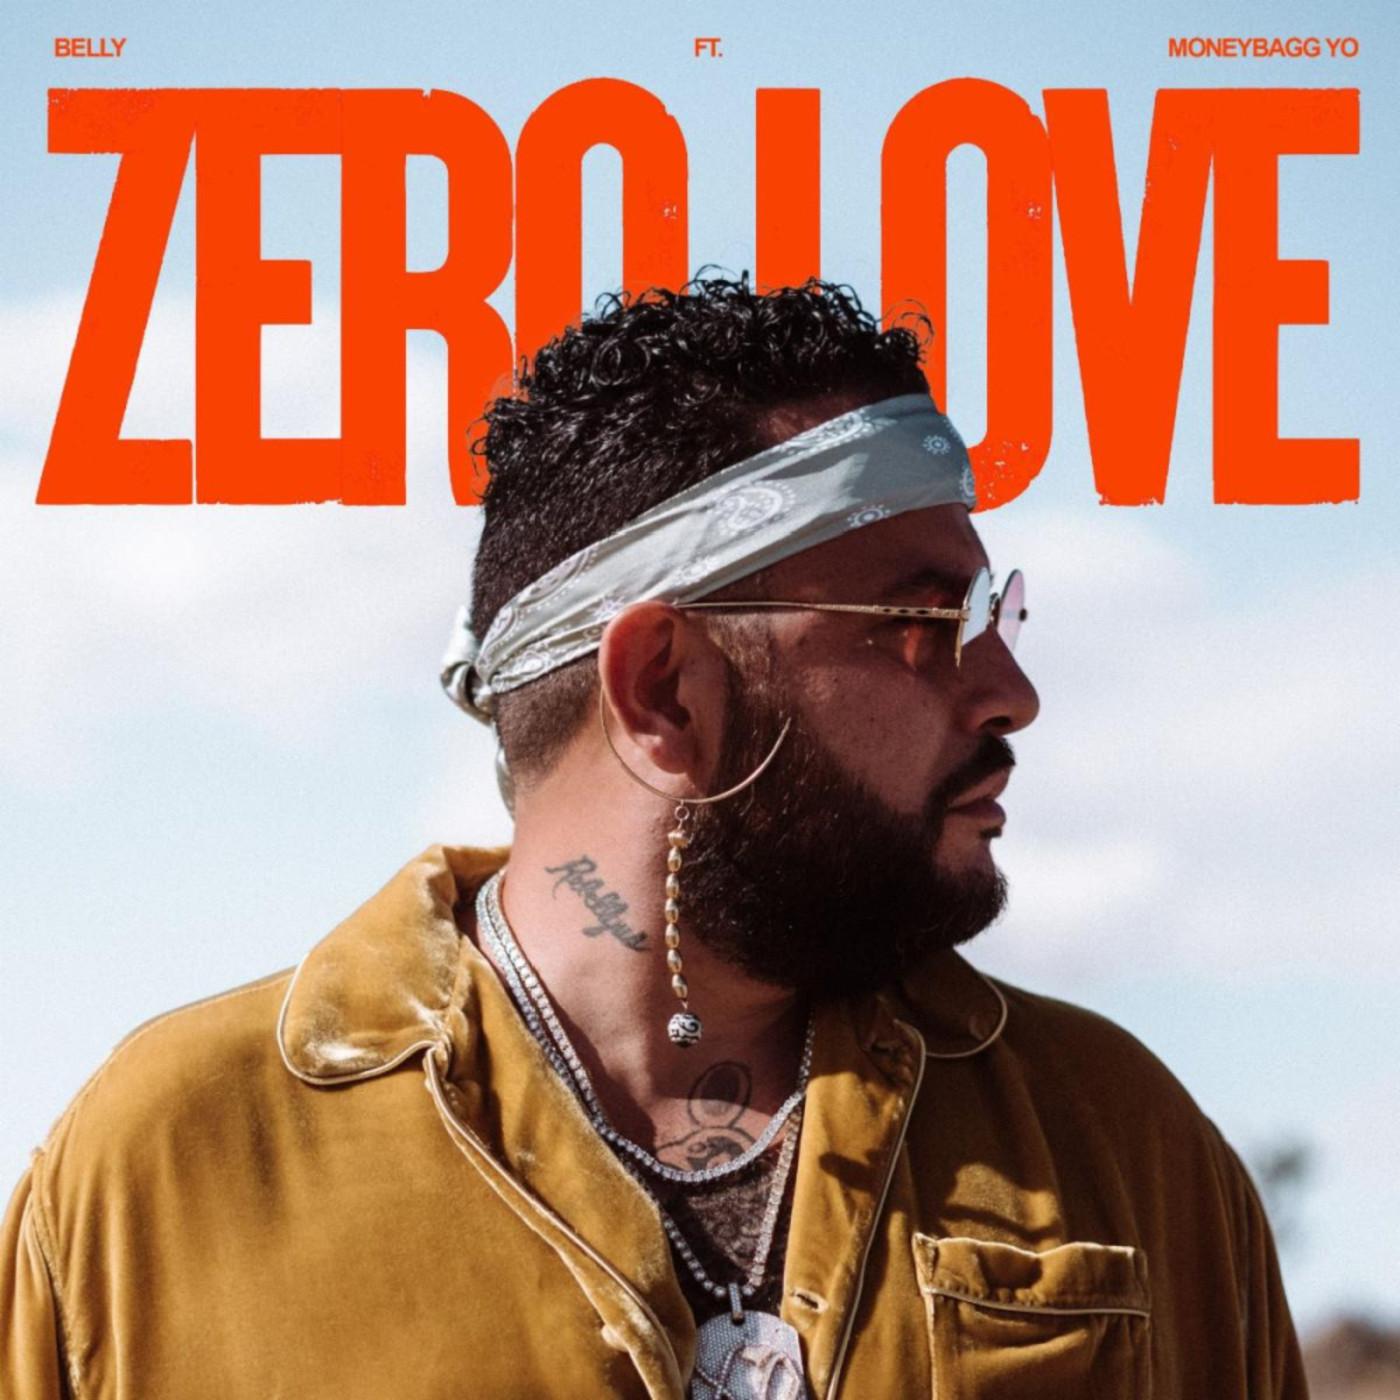 Belly - Zero Love Ft. Moneybagg Yo